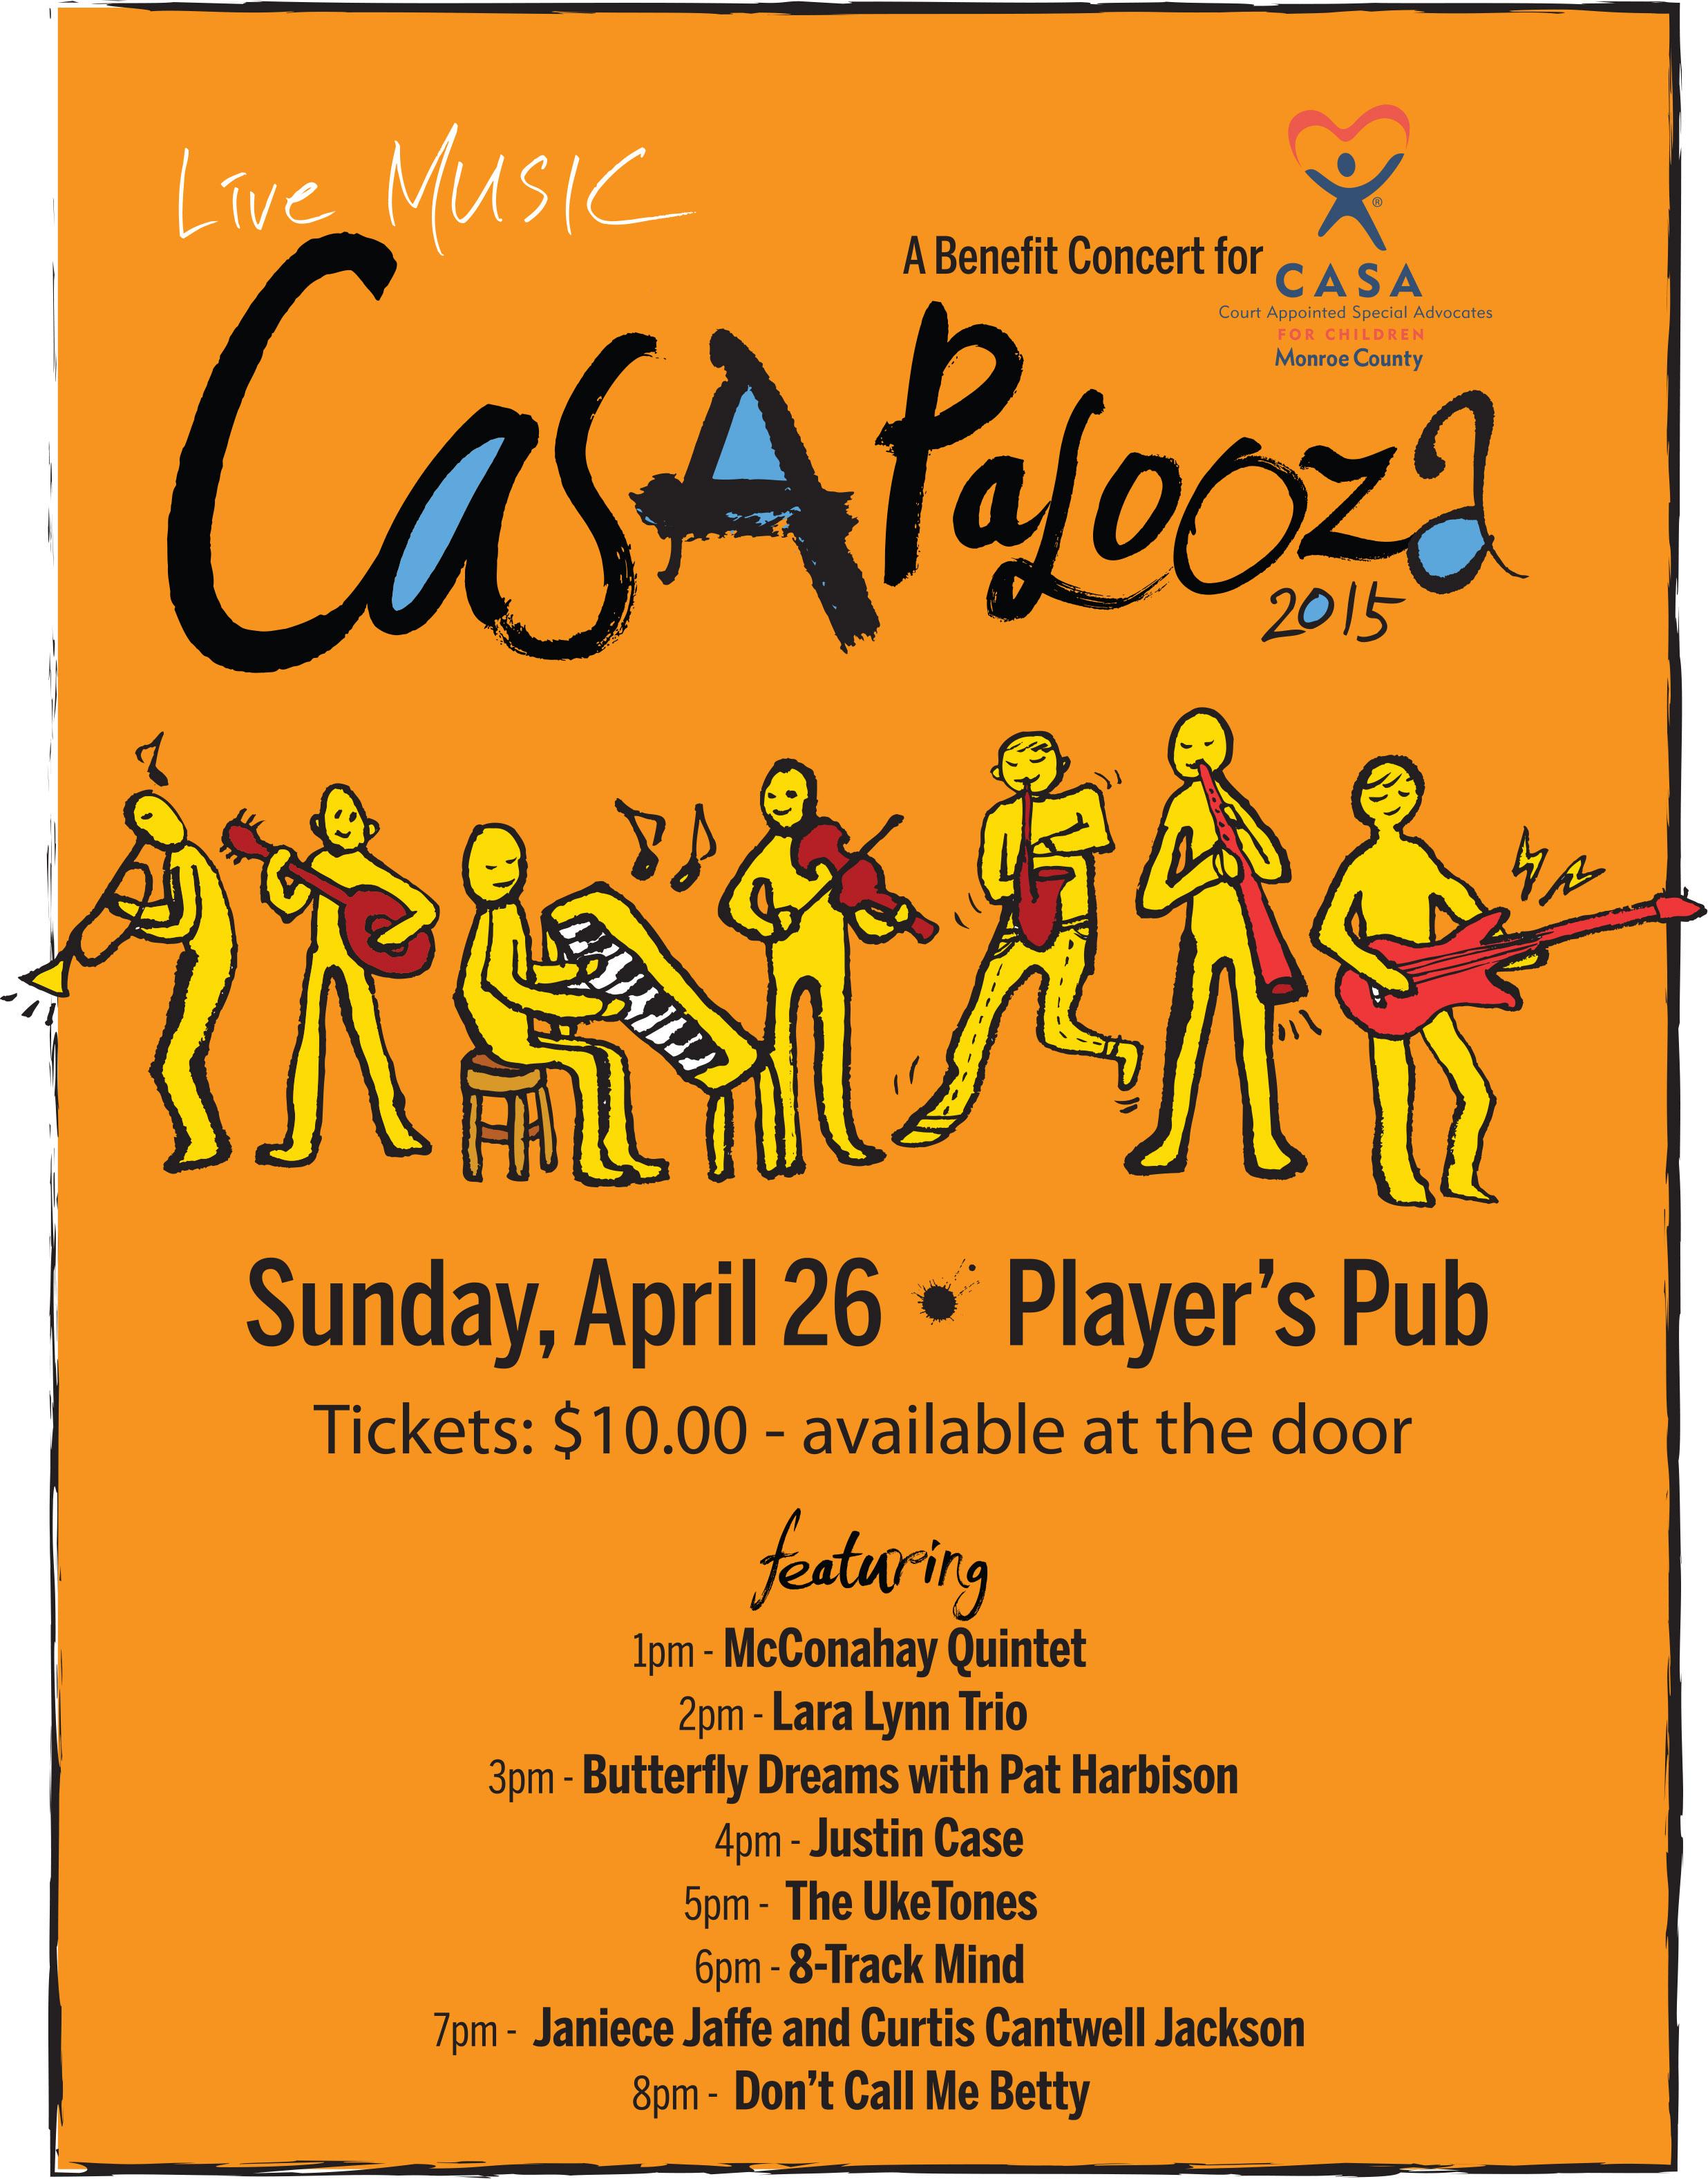 CASApalooza poster